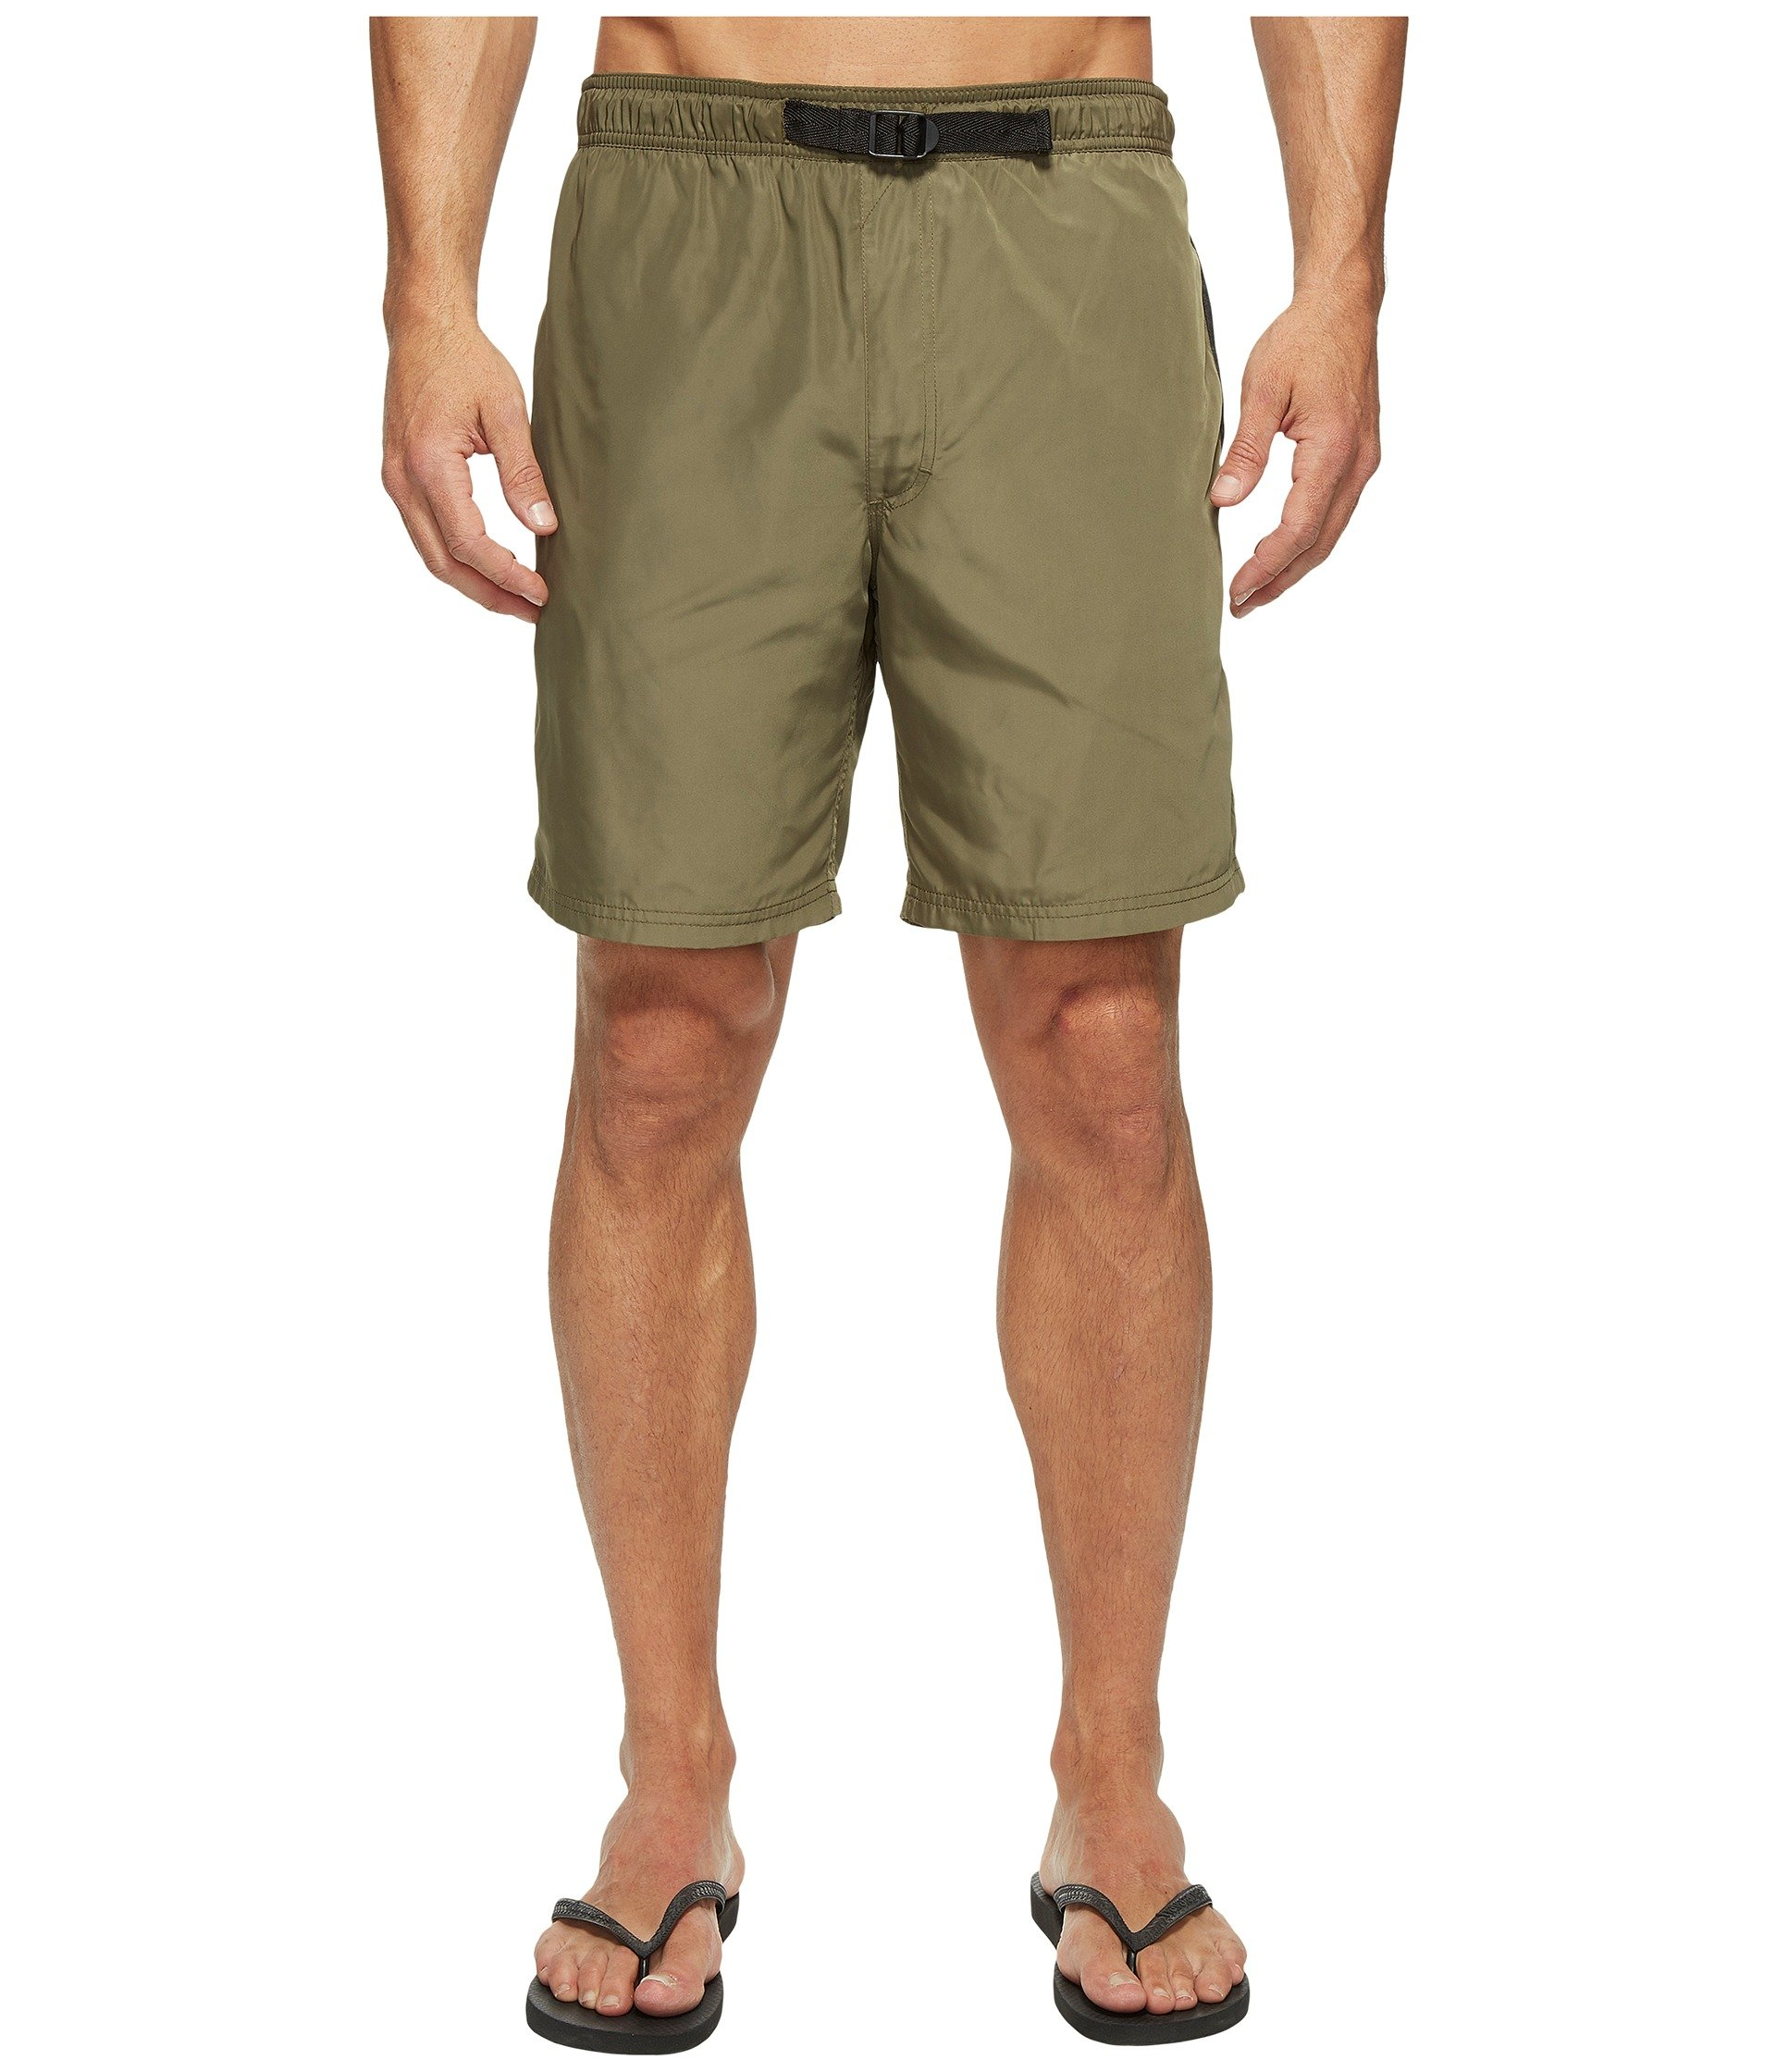 TAVIK Reserve Hybrid Shorts, Olive